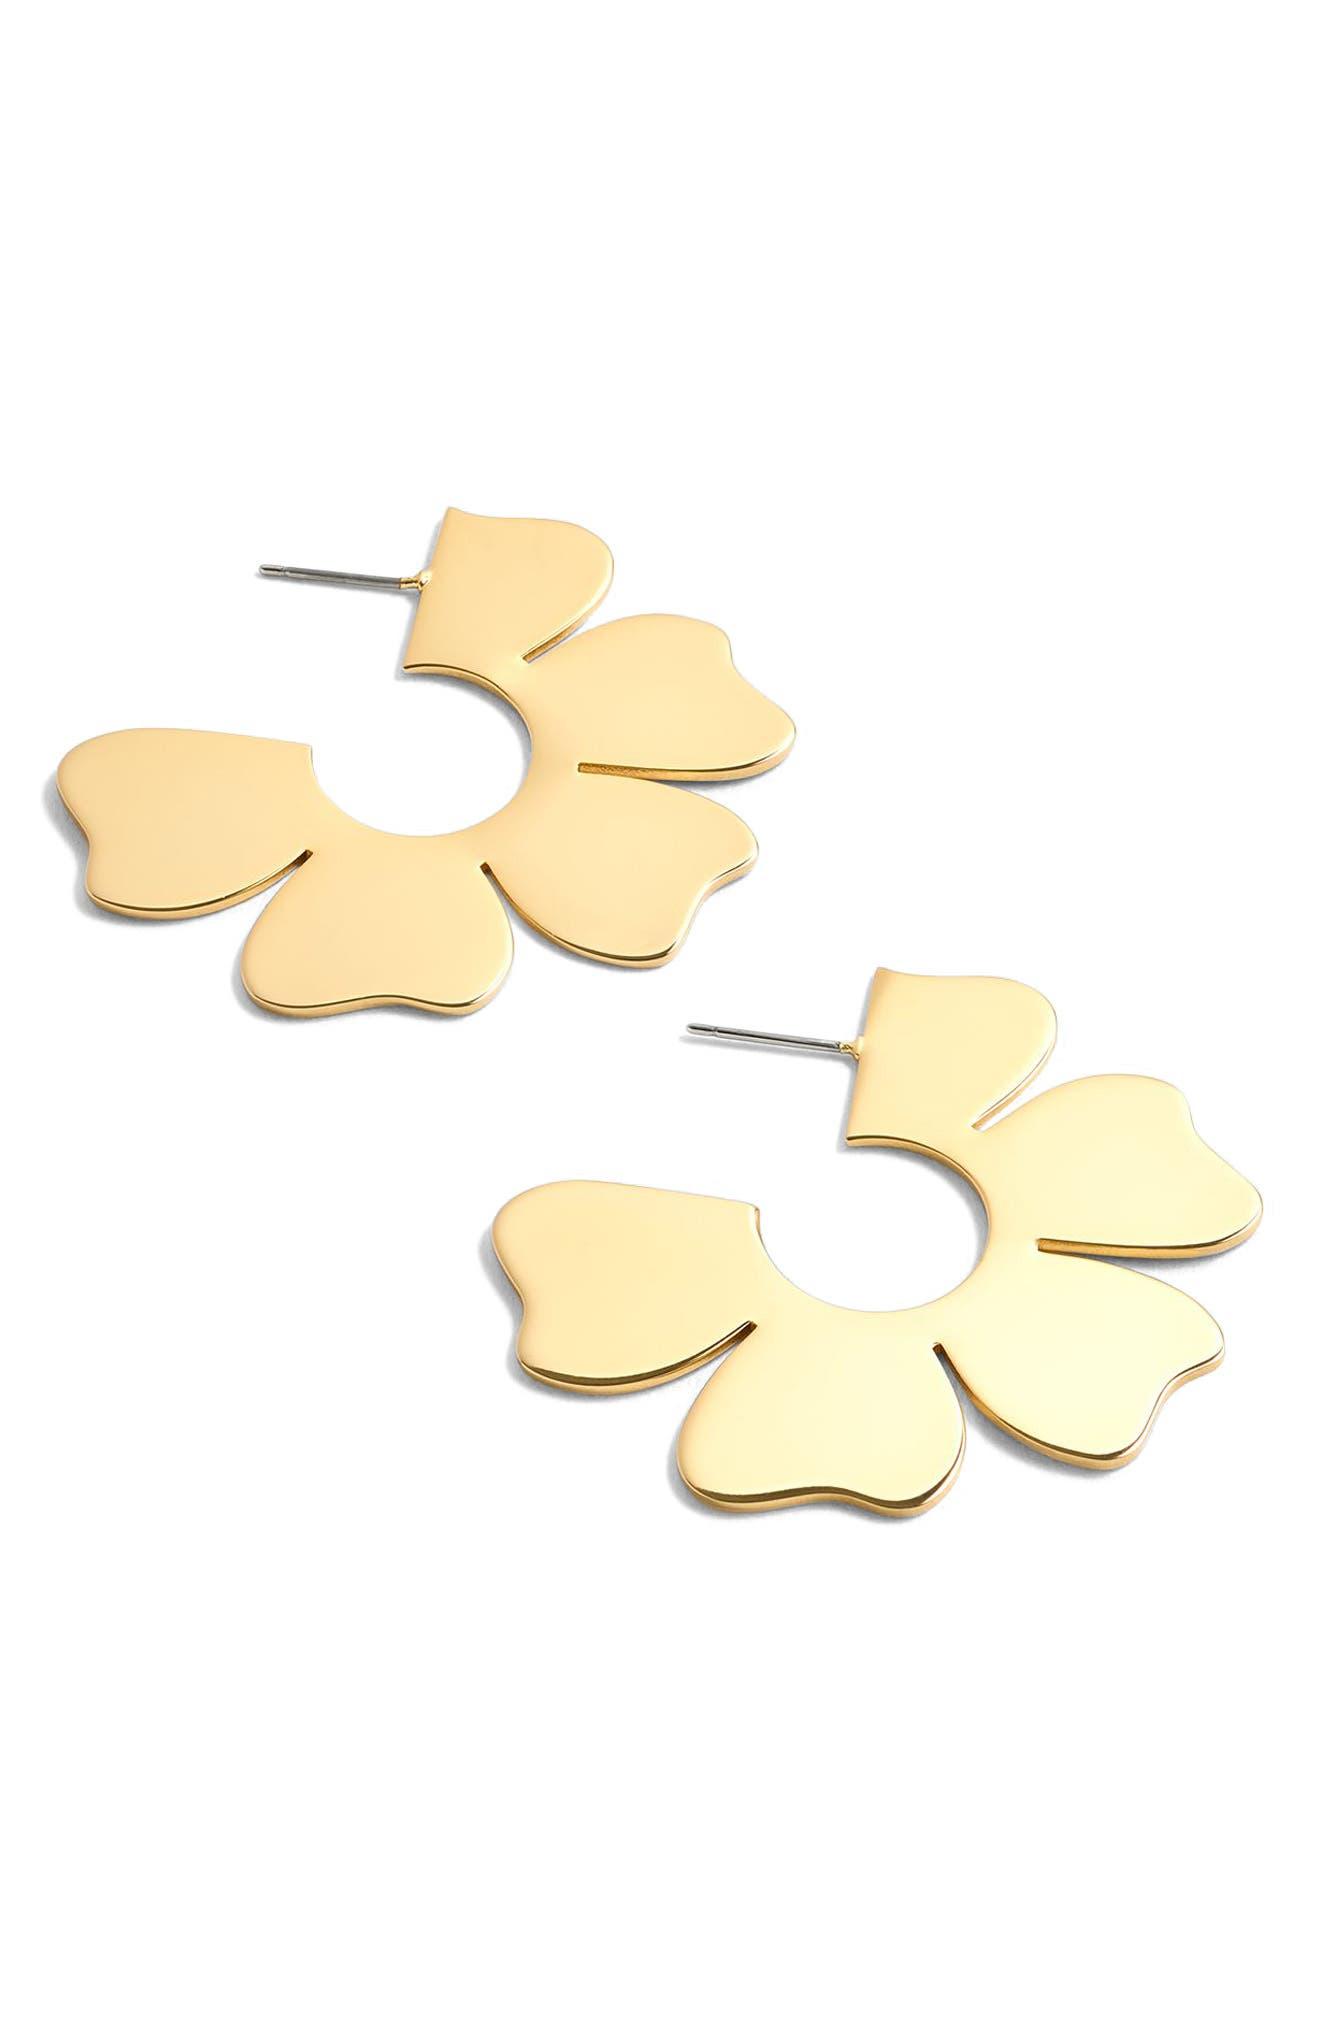 J.Crew Flat Flower Hoop Earrings,                             Alternate thumbnail 4, color,                             Gold